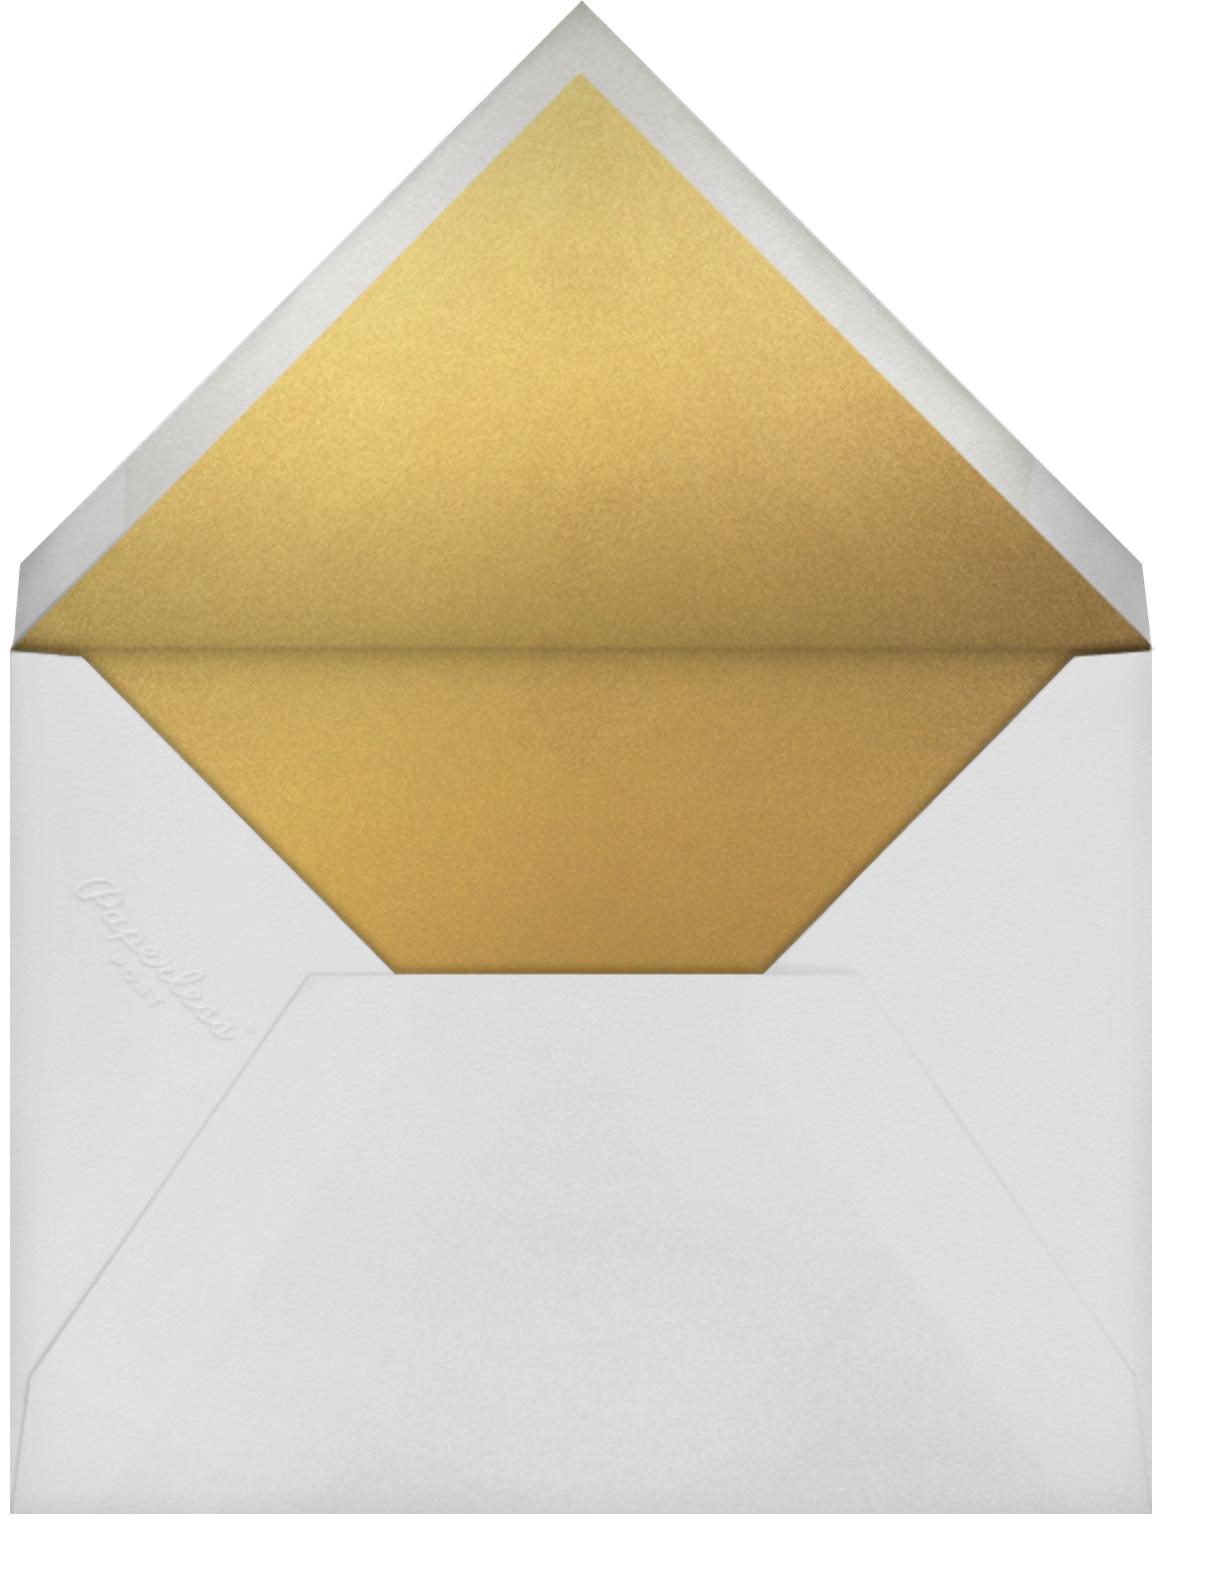 Palmier I - Gold - Paperless Post - All - envelope back